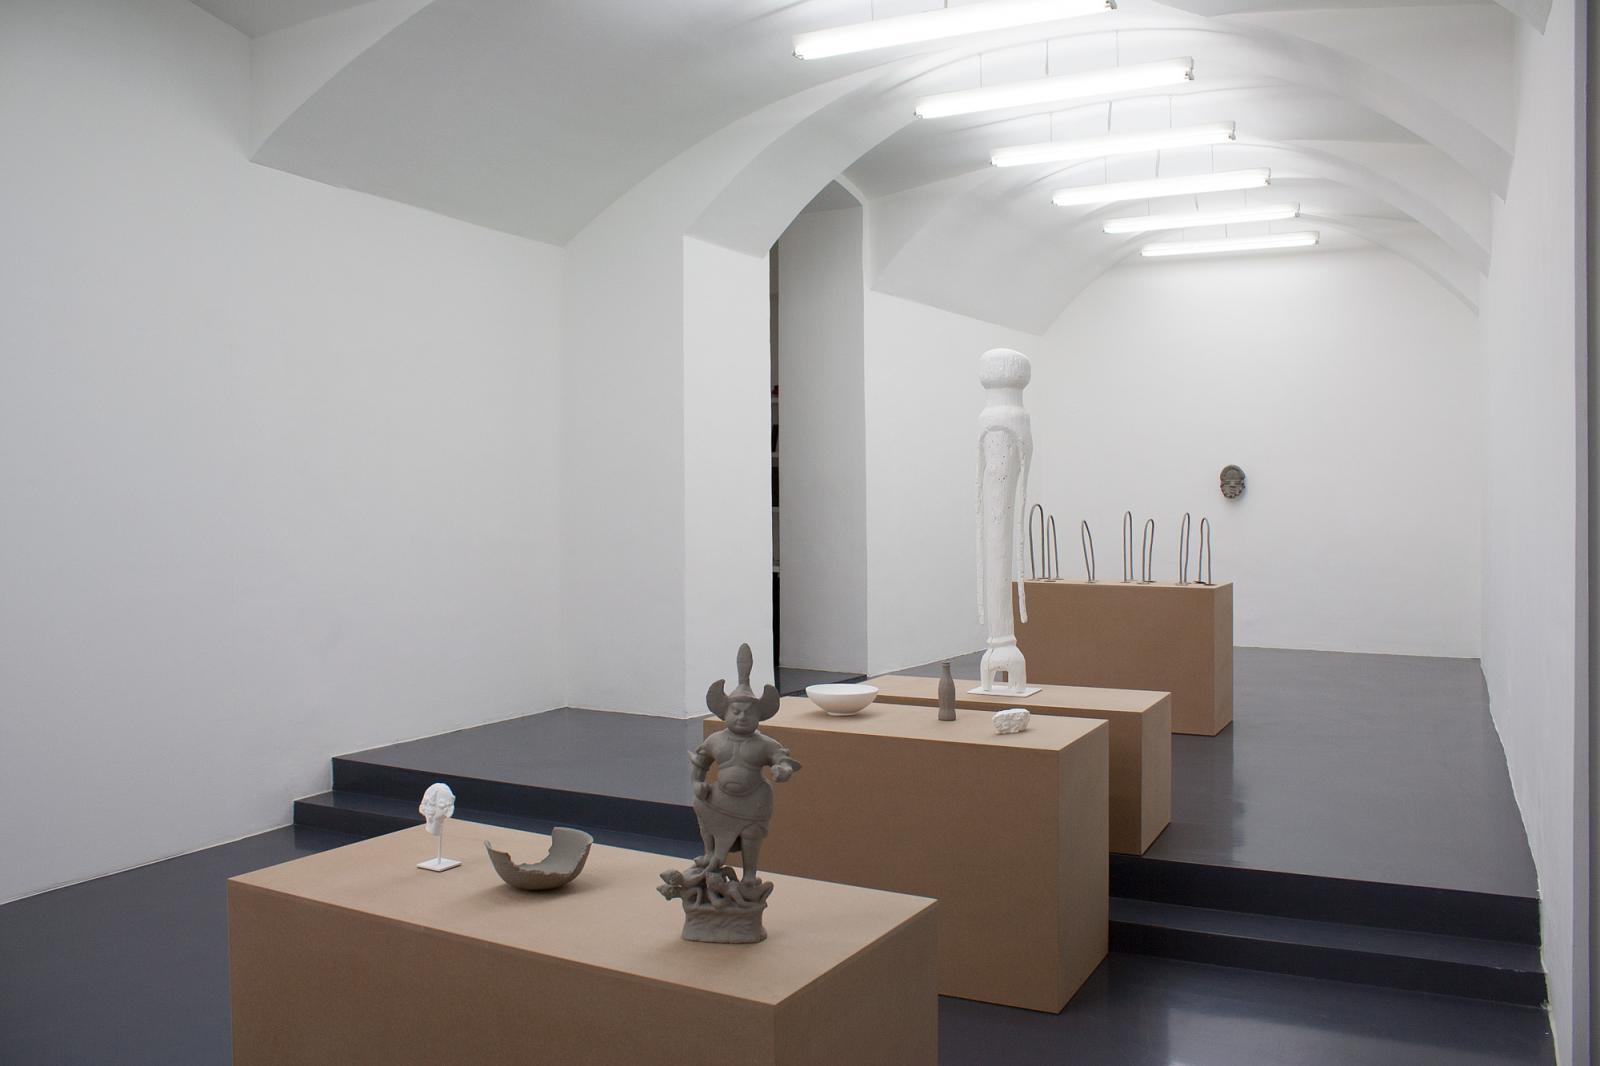 Gaylen Gerber installation view at Galerie Emanuel Layr (2017) Courtesy Galerie Emanuel Layr